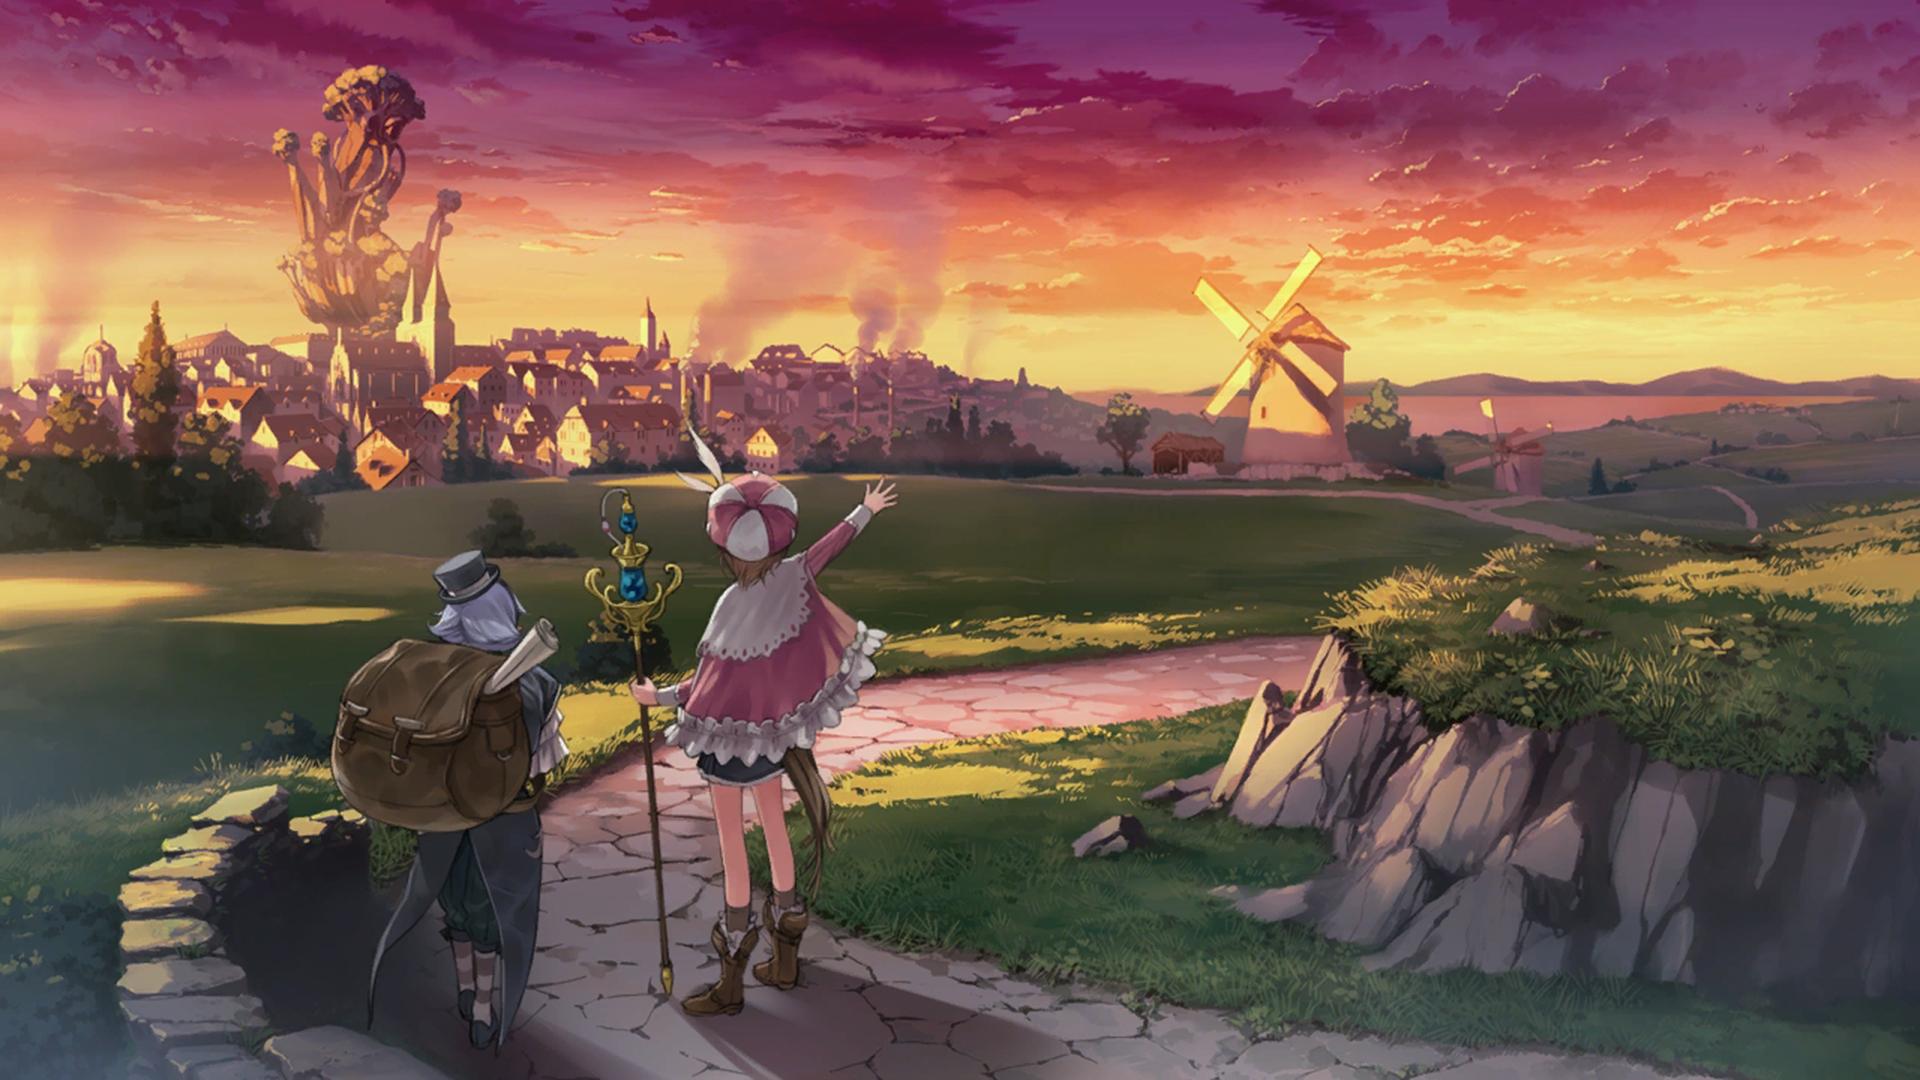 Atelier Rorona The Alchemist of Arland Wallpaper 029